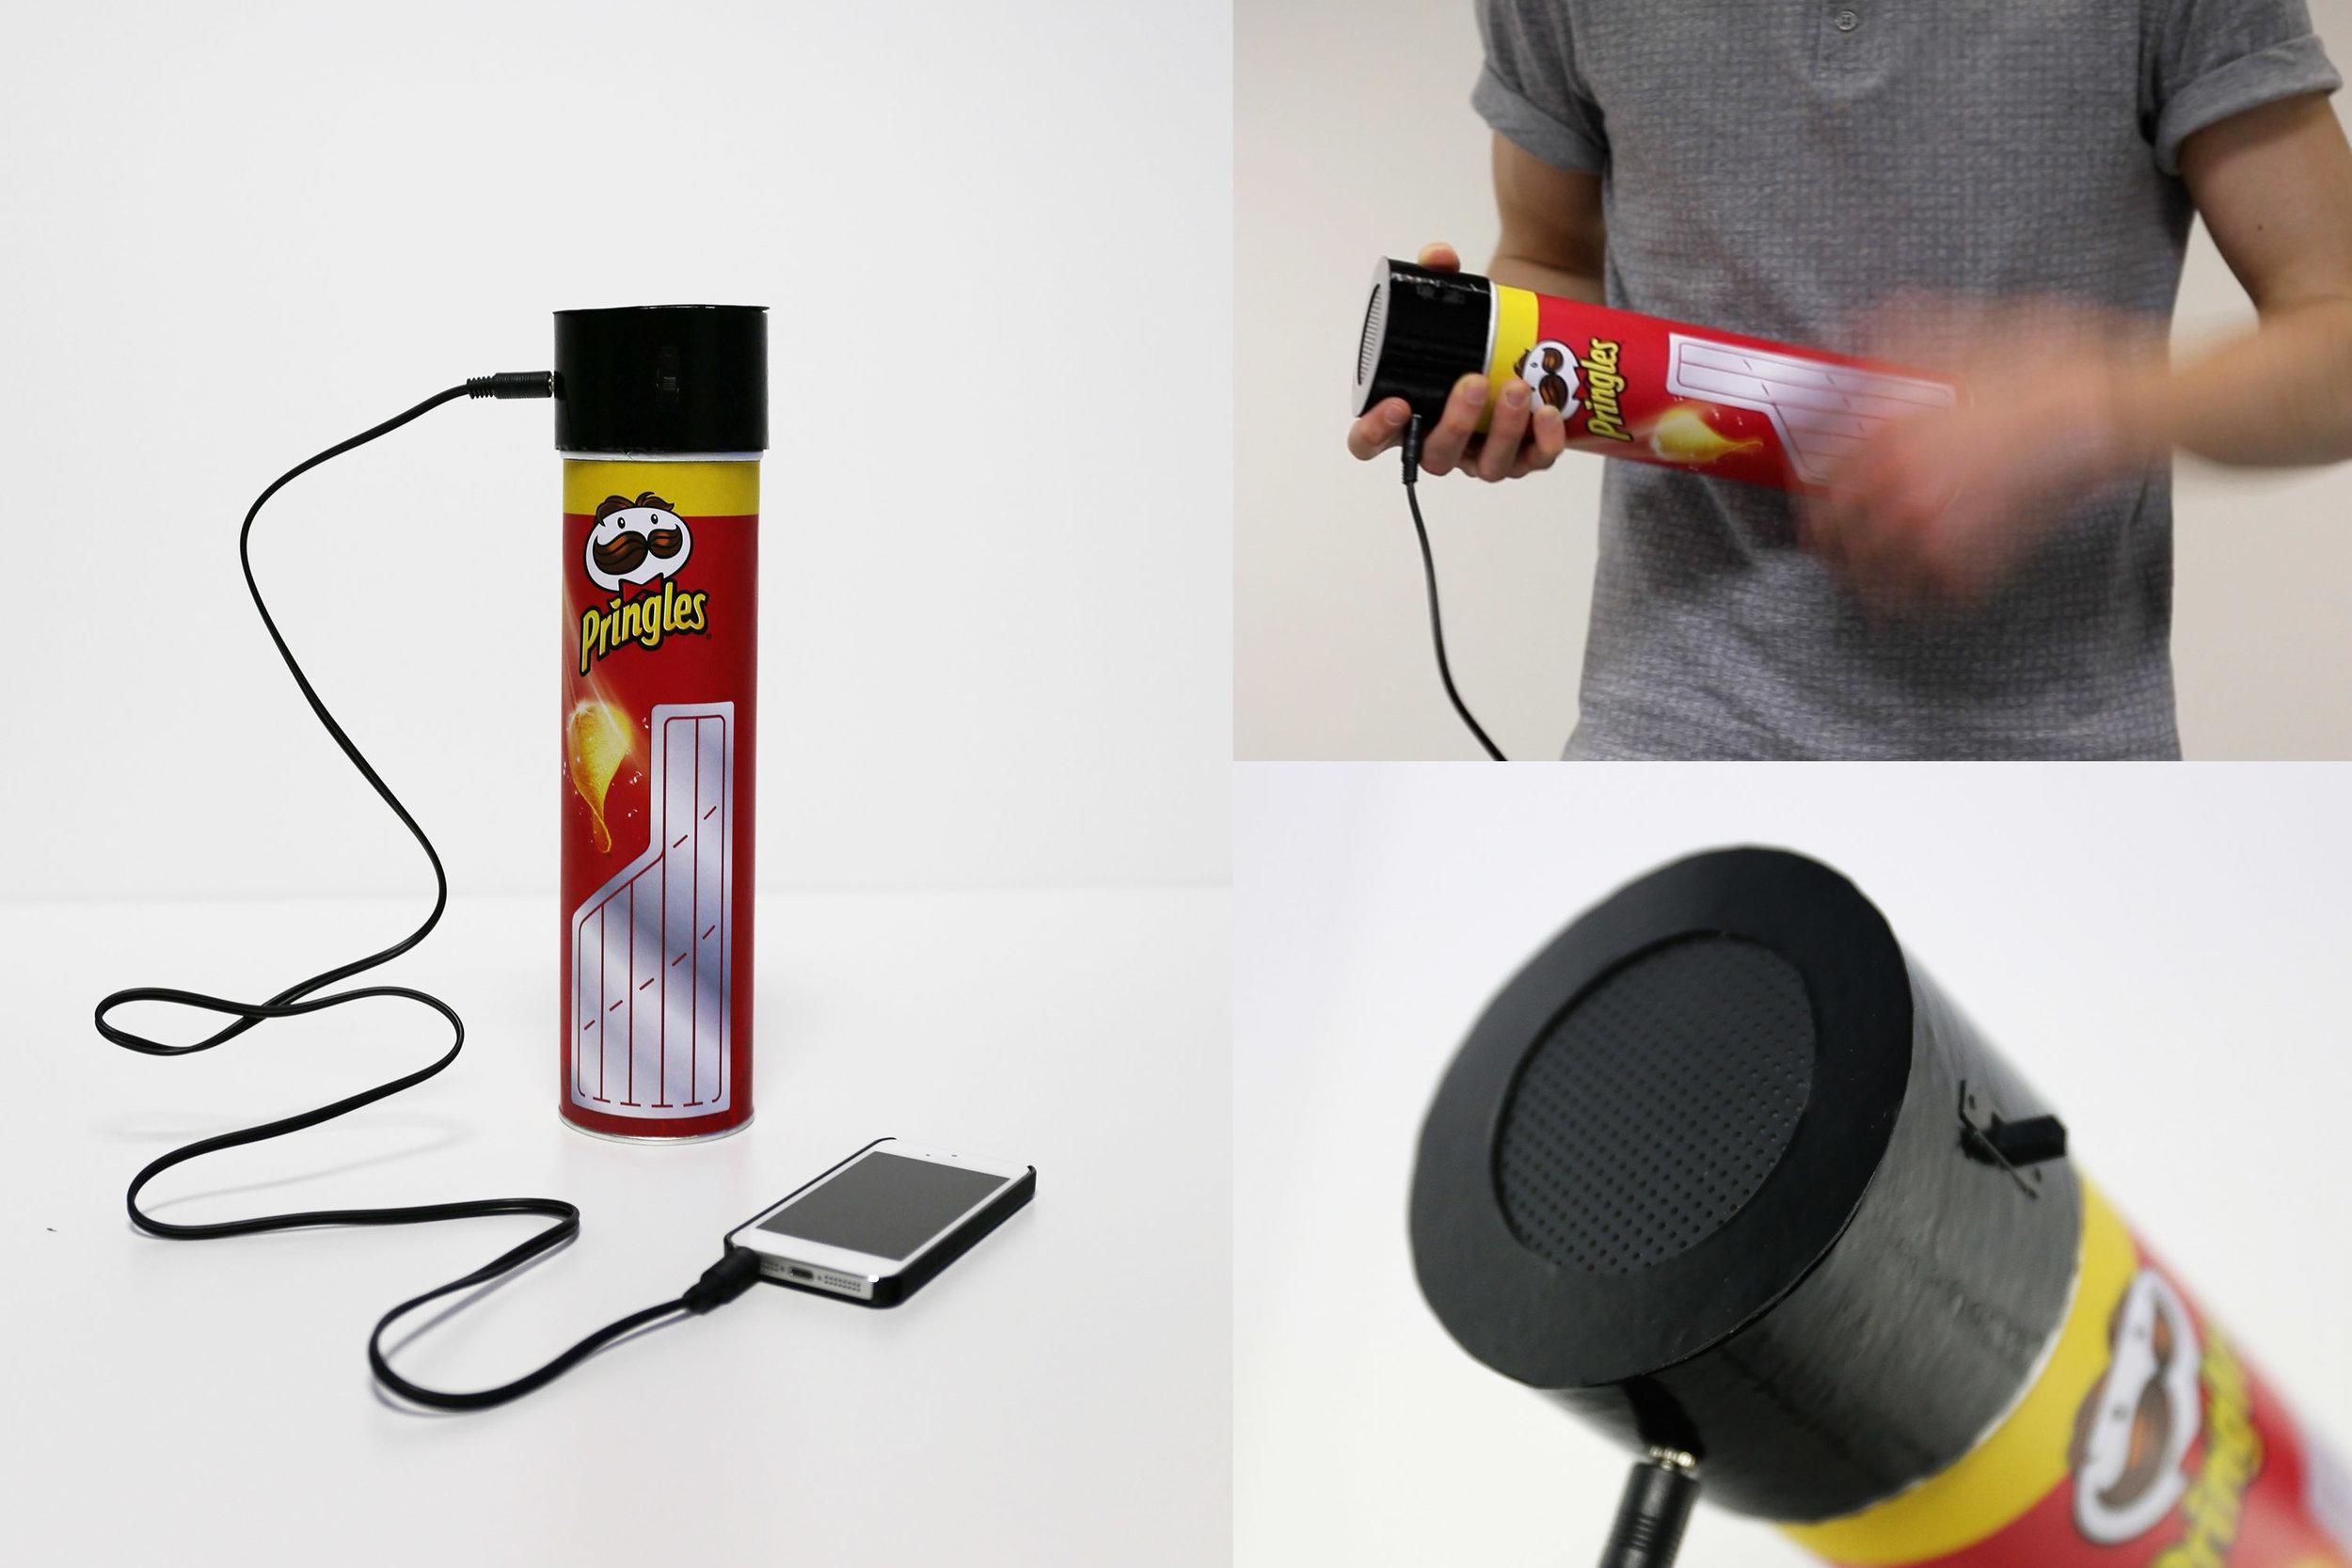 PringlesTapPlayPics.jpg